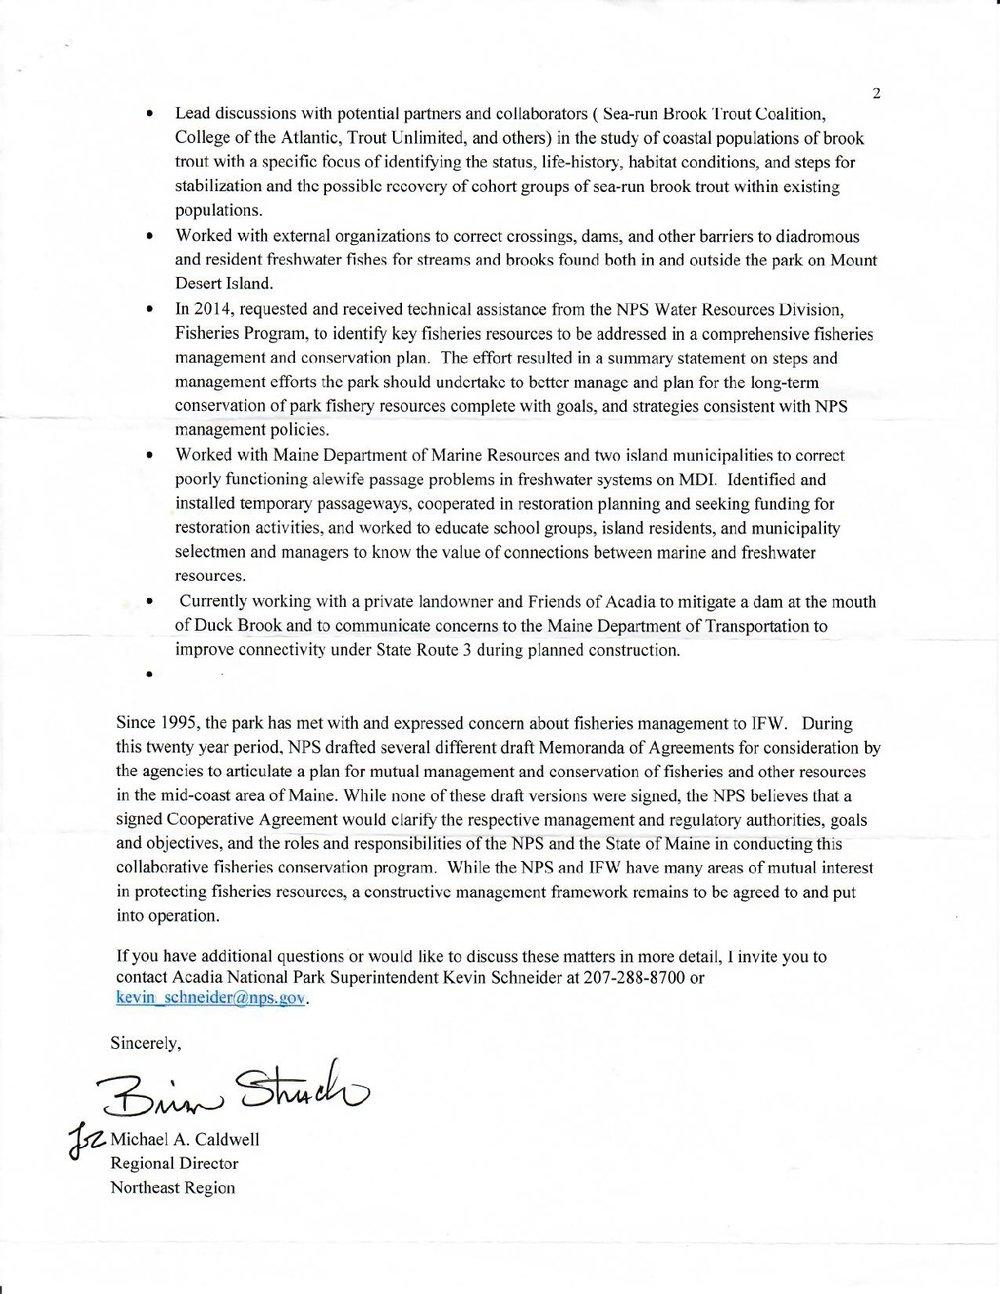 US Dept of Interior Letter- 7.5.16 (2).jpg